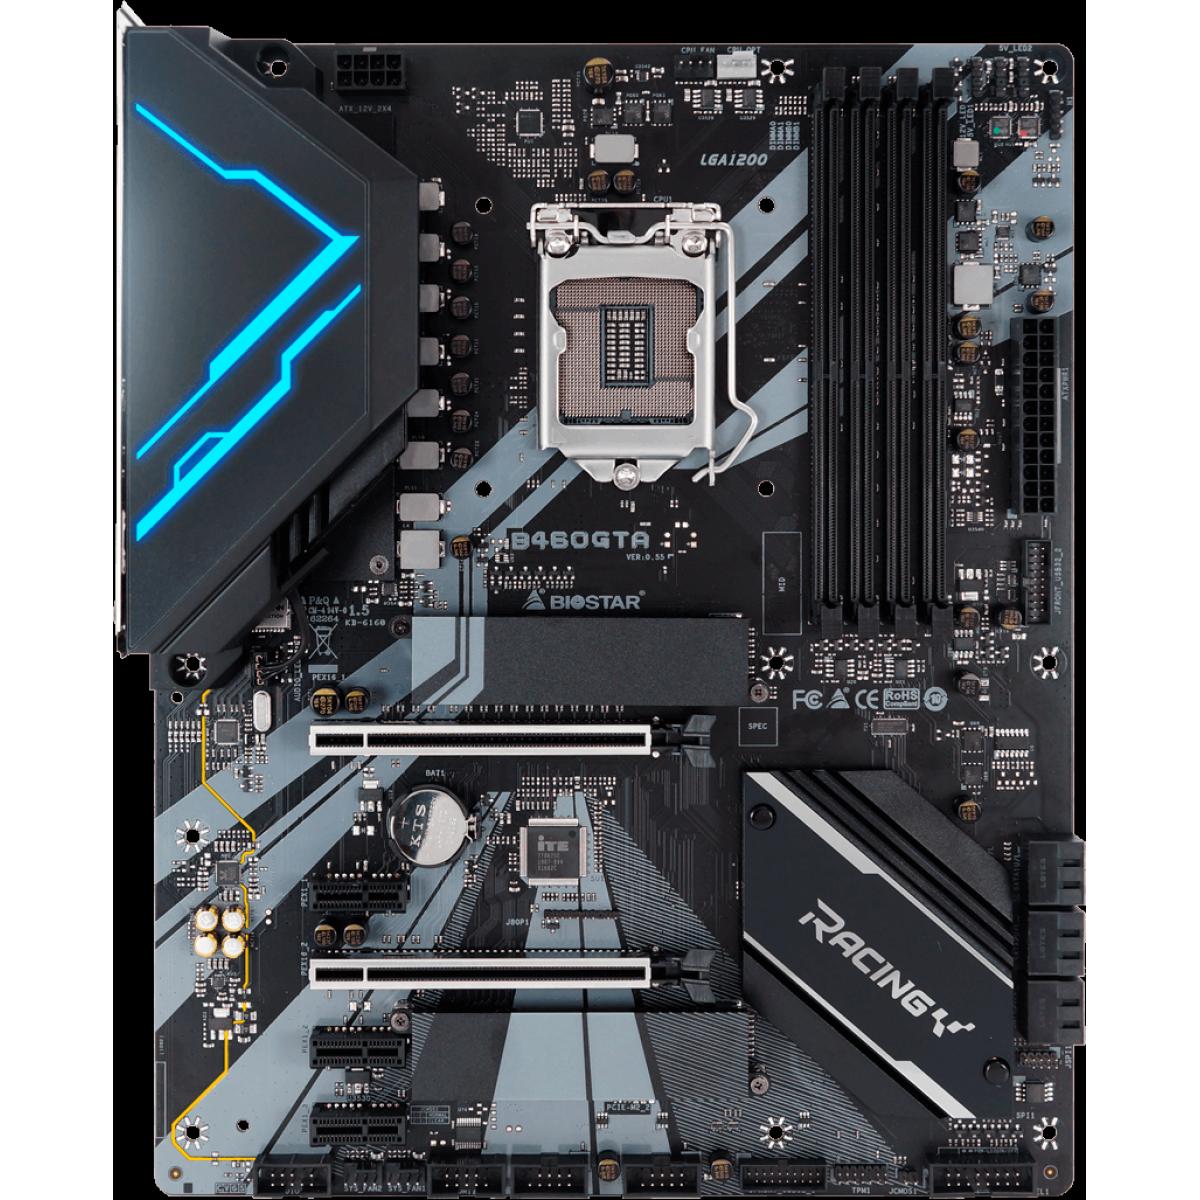 Placa Mãe Biostar Racing B460GTA VER 5.0, Chipset B460, Intel 1200, ATX, DDR4